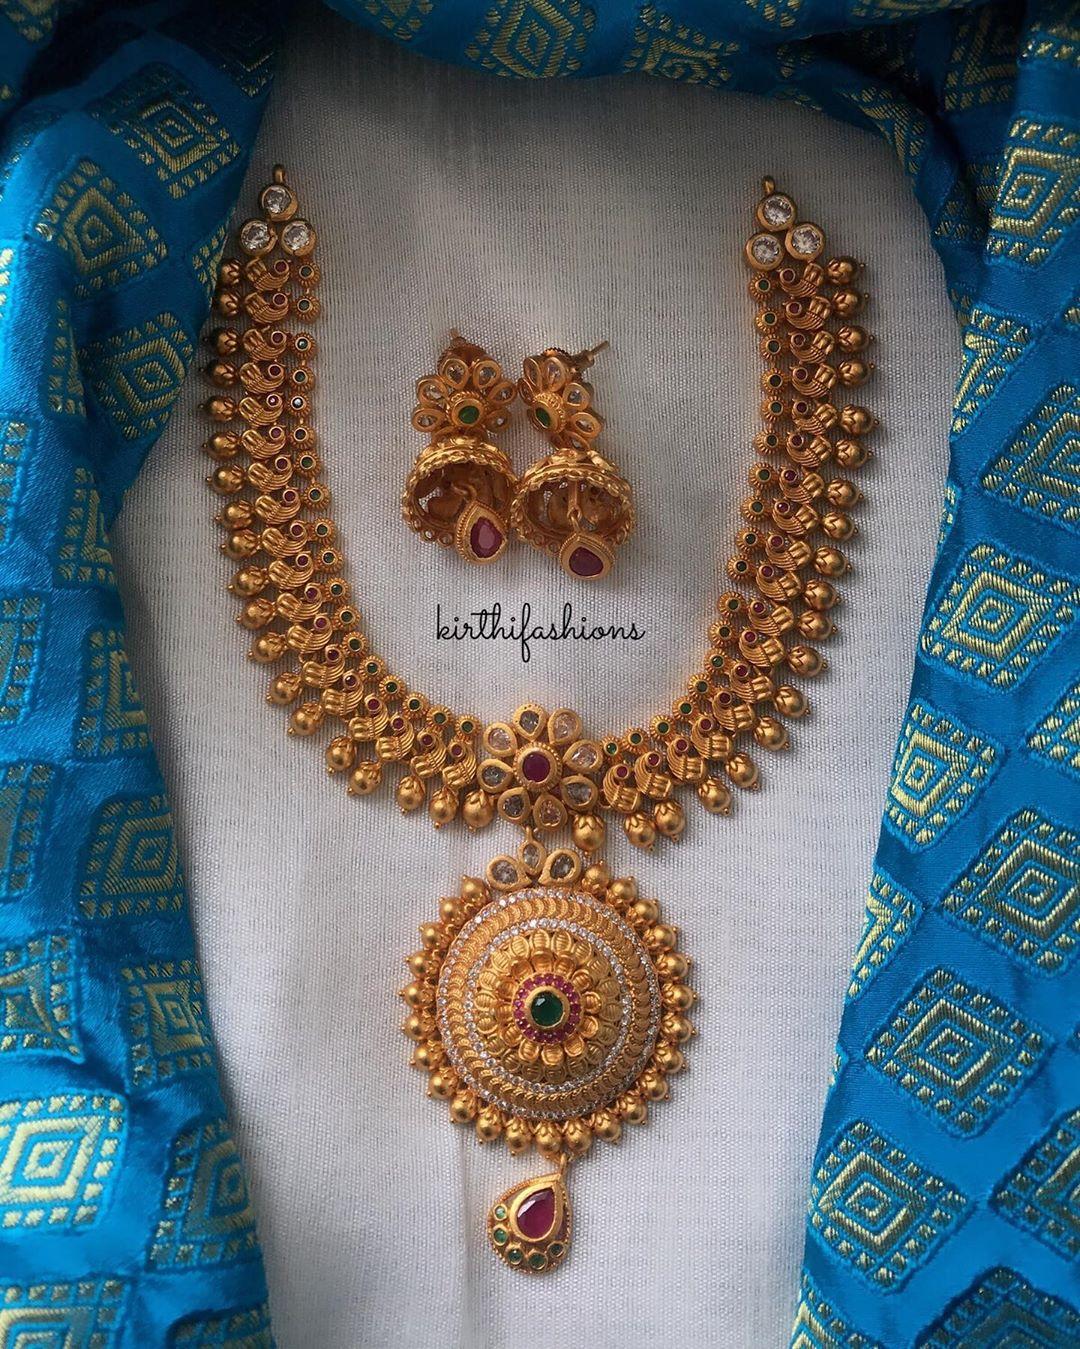 imitation-jewellery-online-shopping